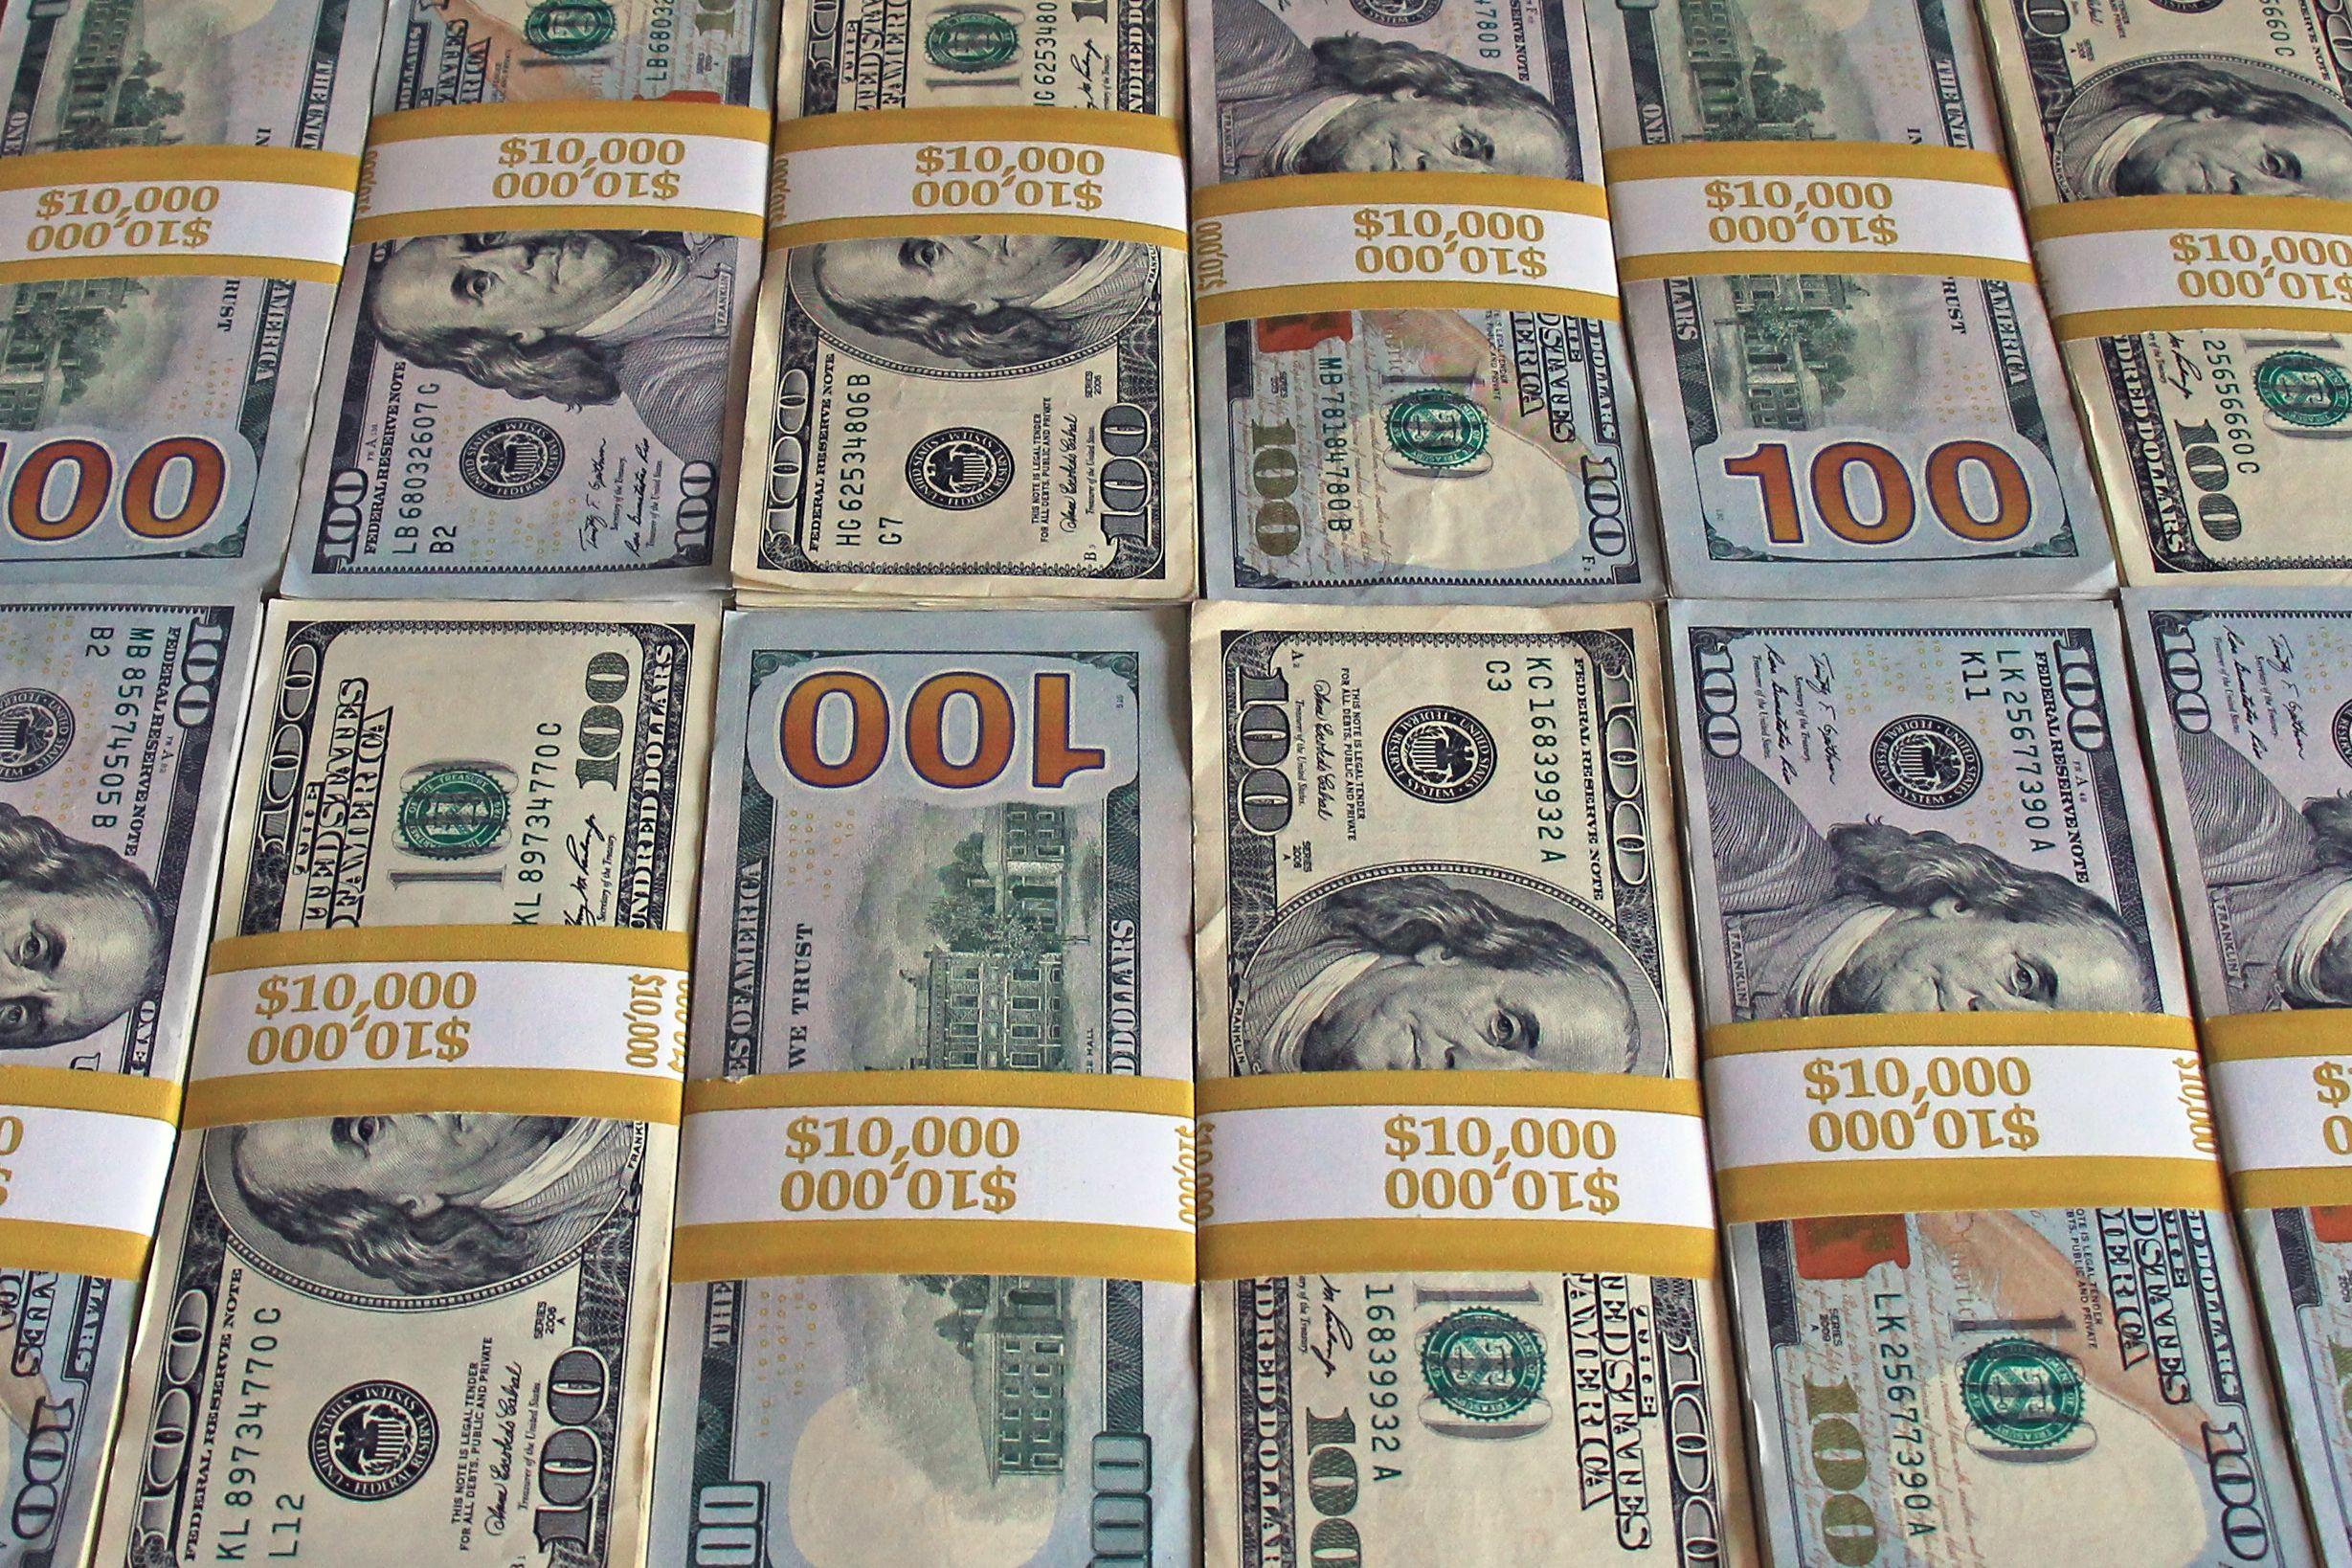 Big Money 100 Dollar Stacks For Your Motivation Enjoy With